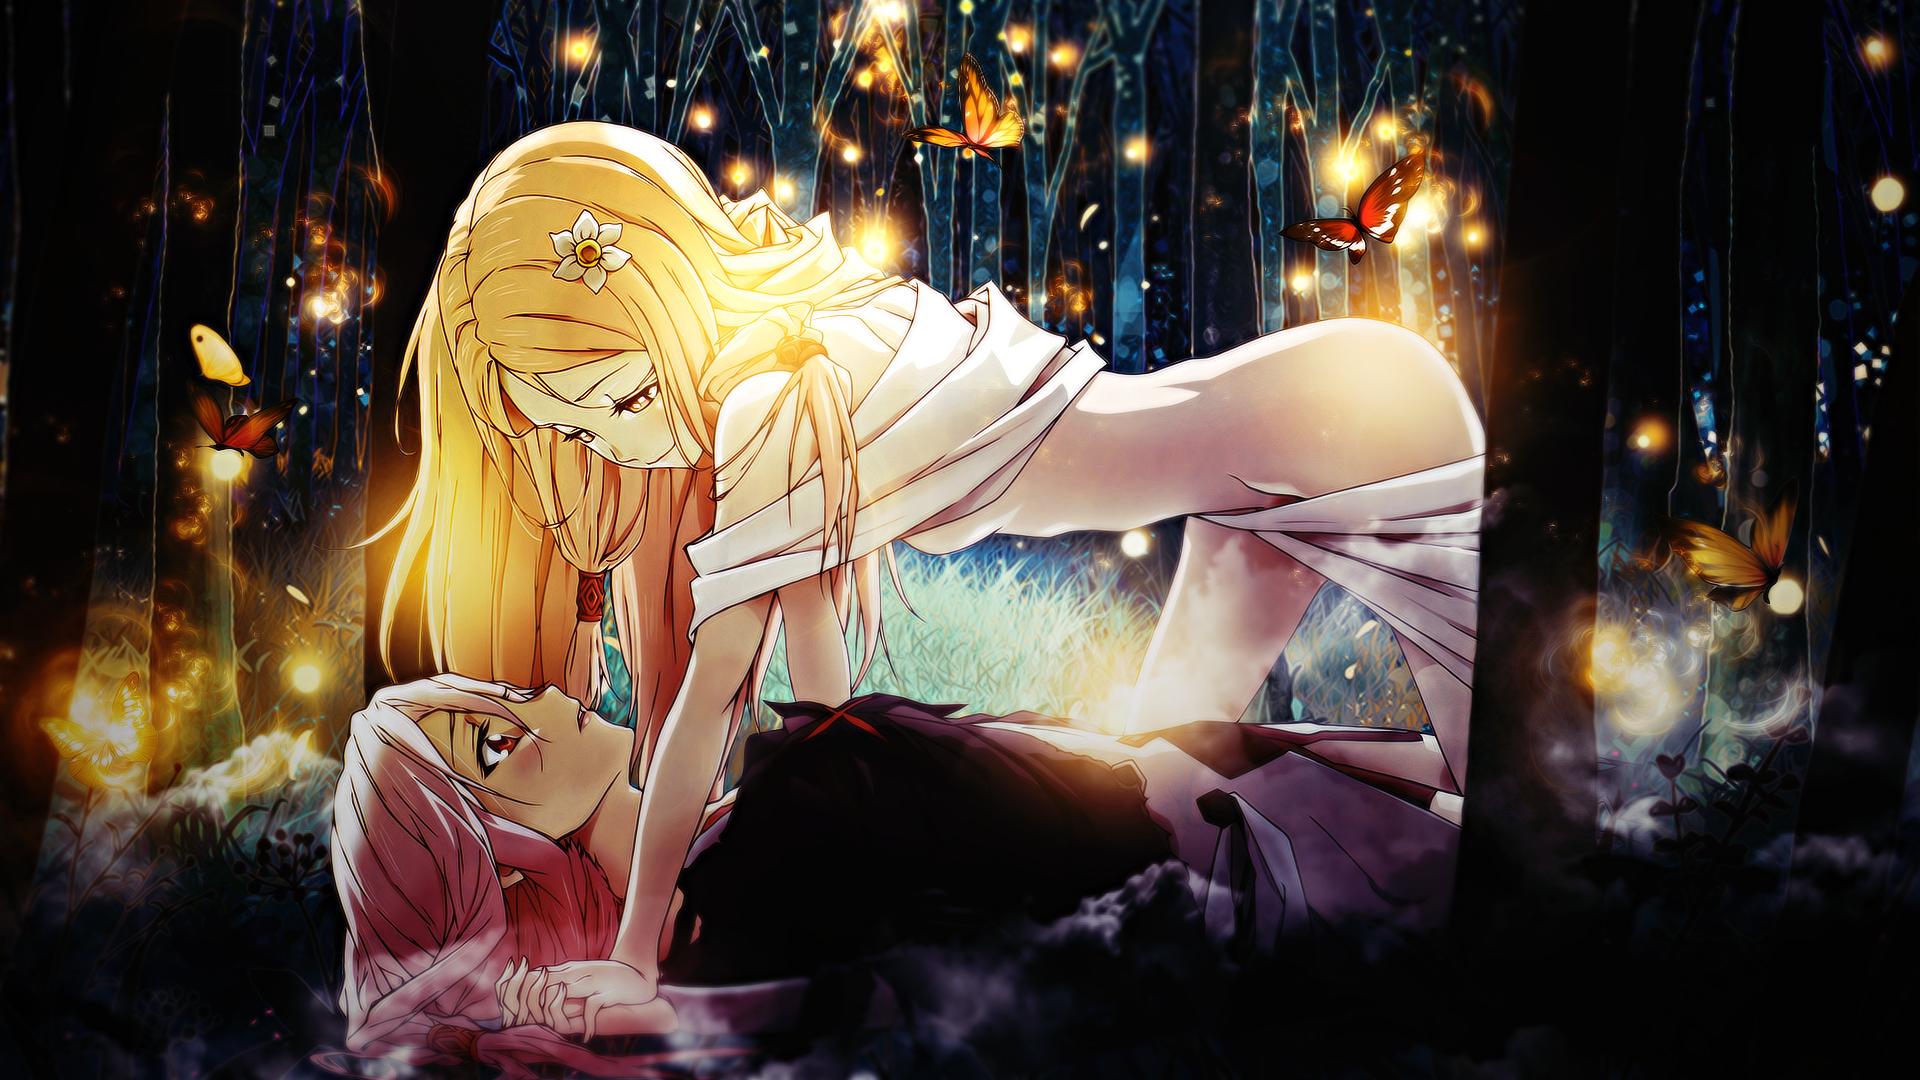 Fond d'écran : Ouma Mana, Yuzuriha Inori, Guilty Crown, Filles anime, Anime, Cheveux roses ...